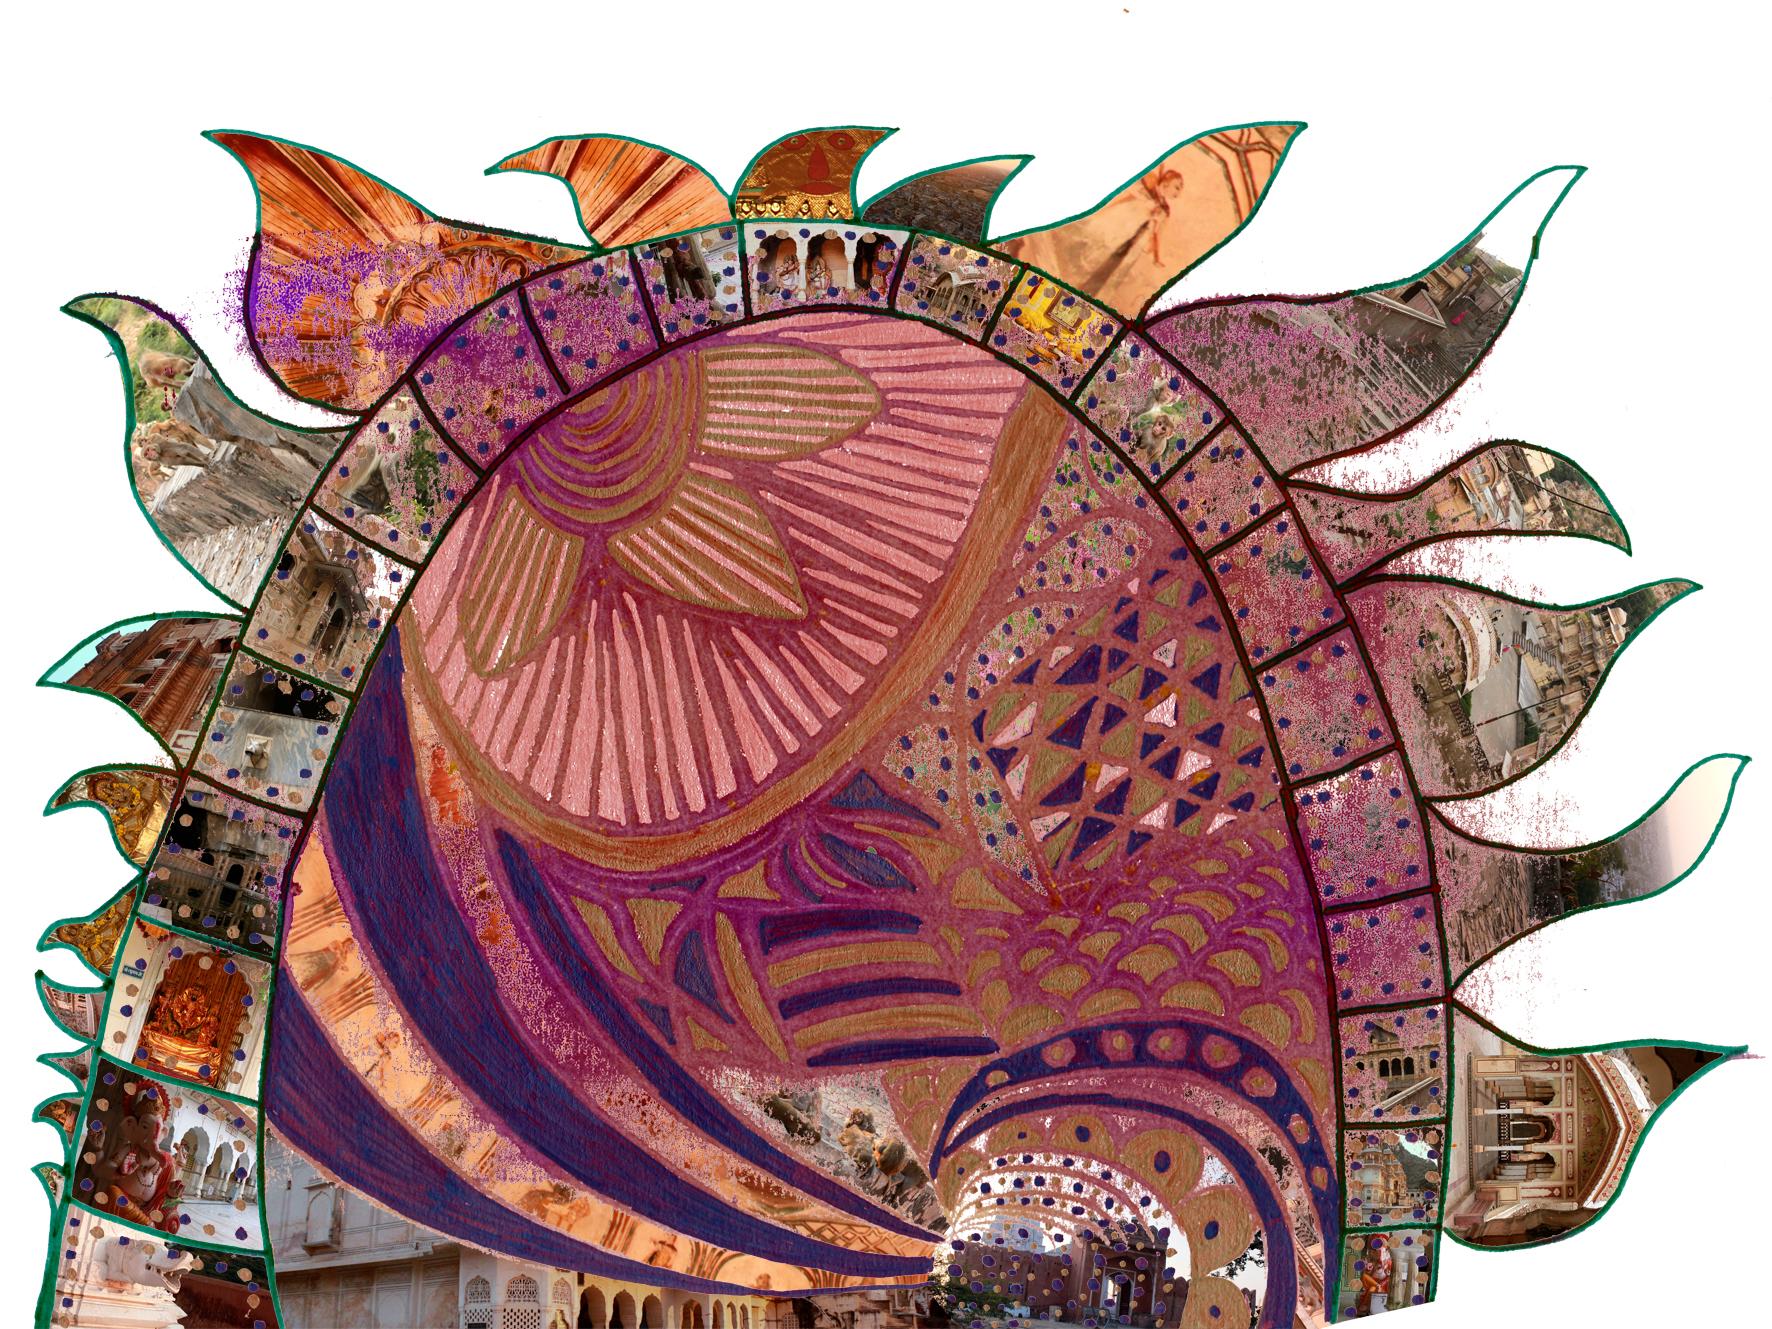 Sonnengot Surya. Galta, Jaipur. Fotocollage, 80x60 C-Print, matt